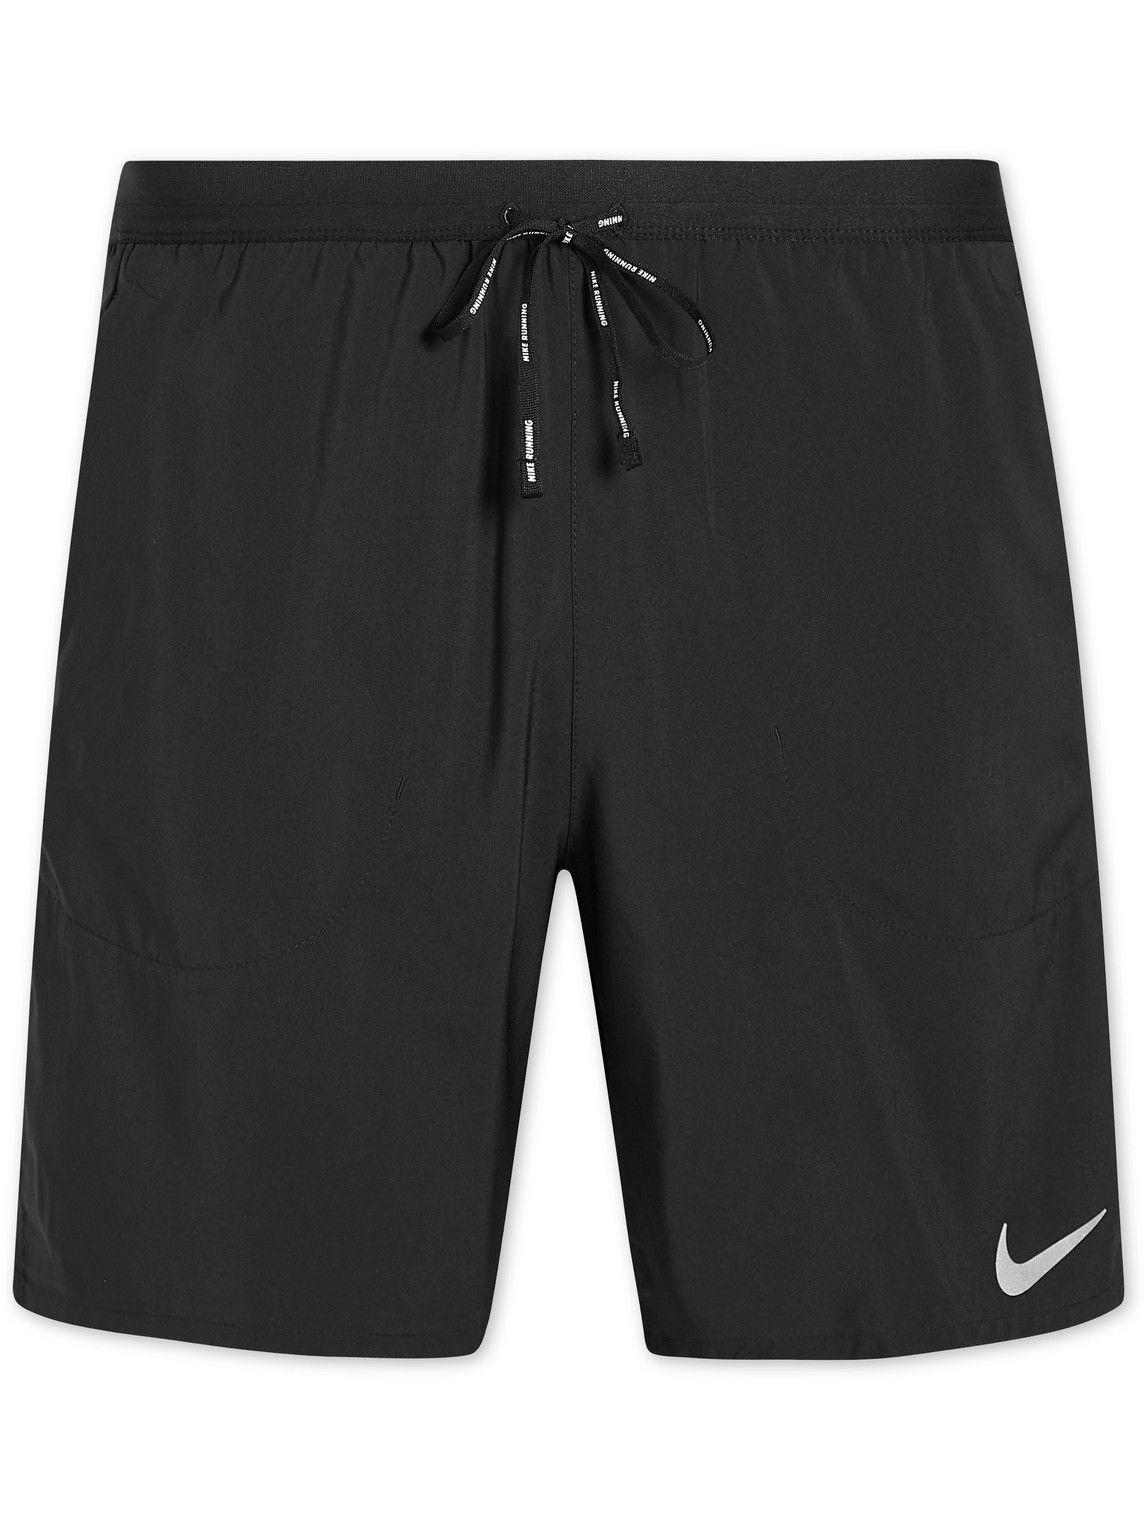 Photo: Nike Running - Flex Stride Recycled Shell Shorts - Black